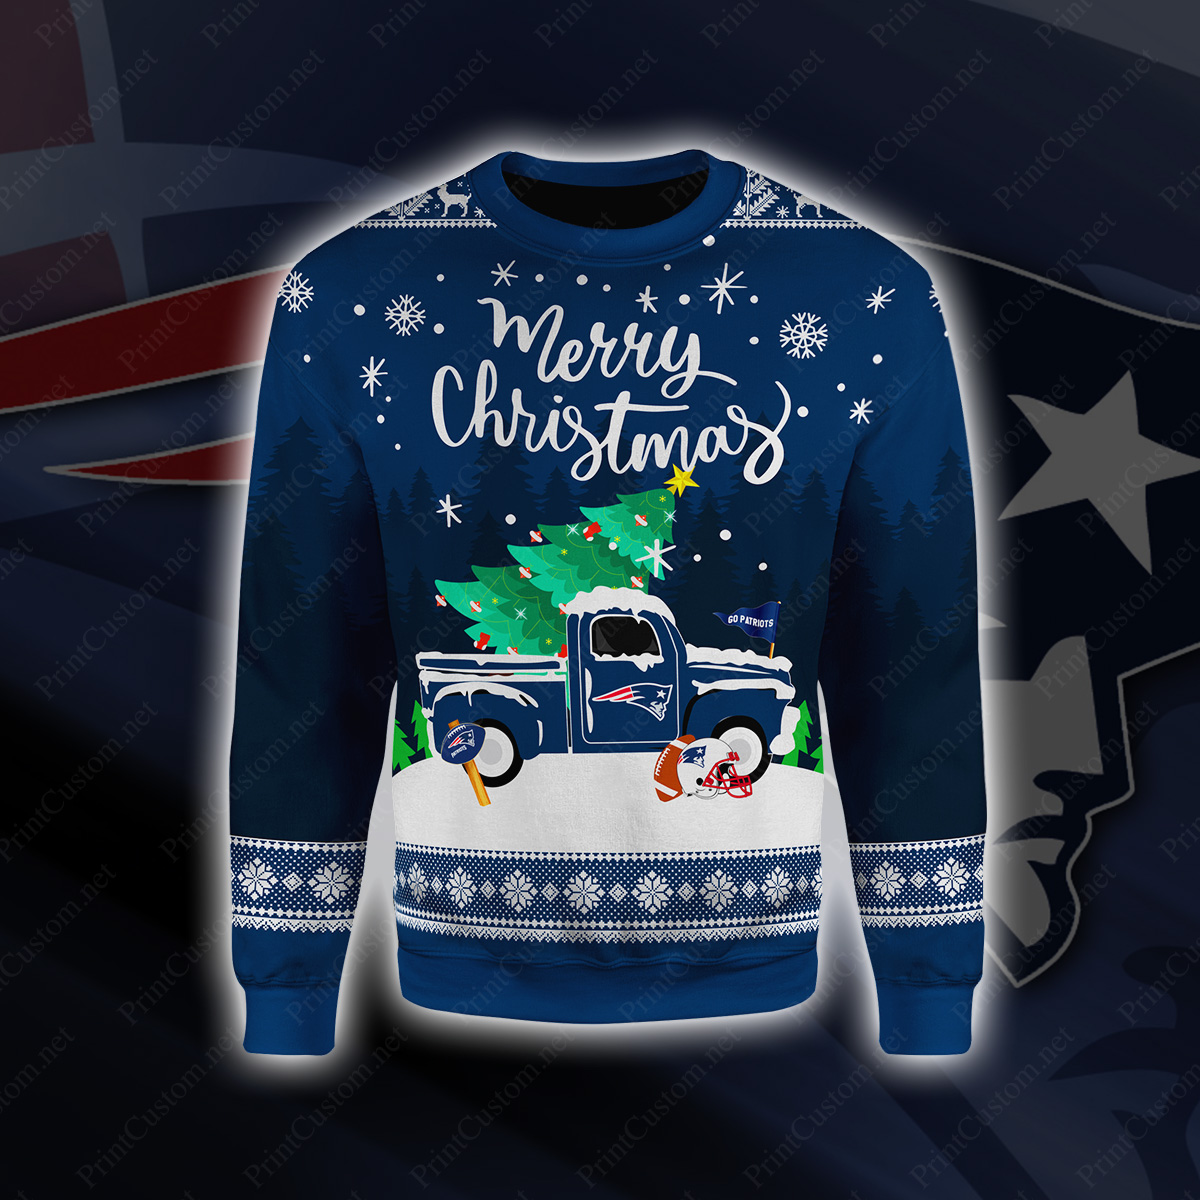 New england patriots merry christmas full printing shirt 1